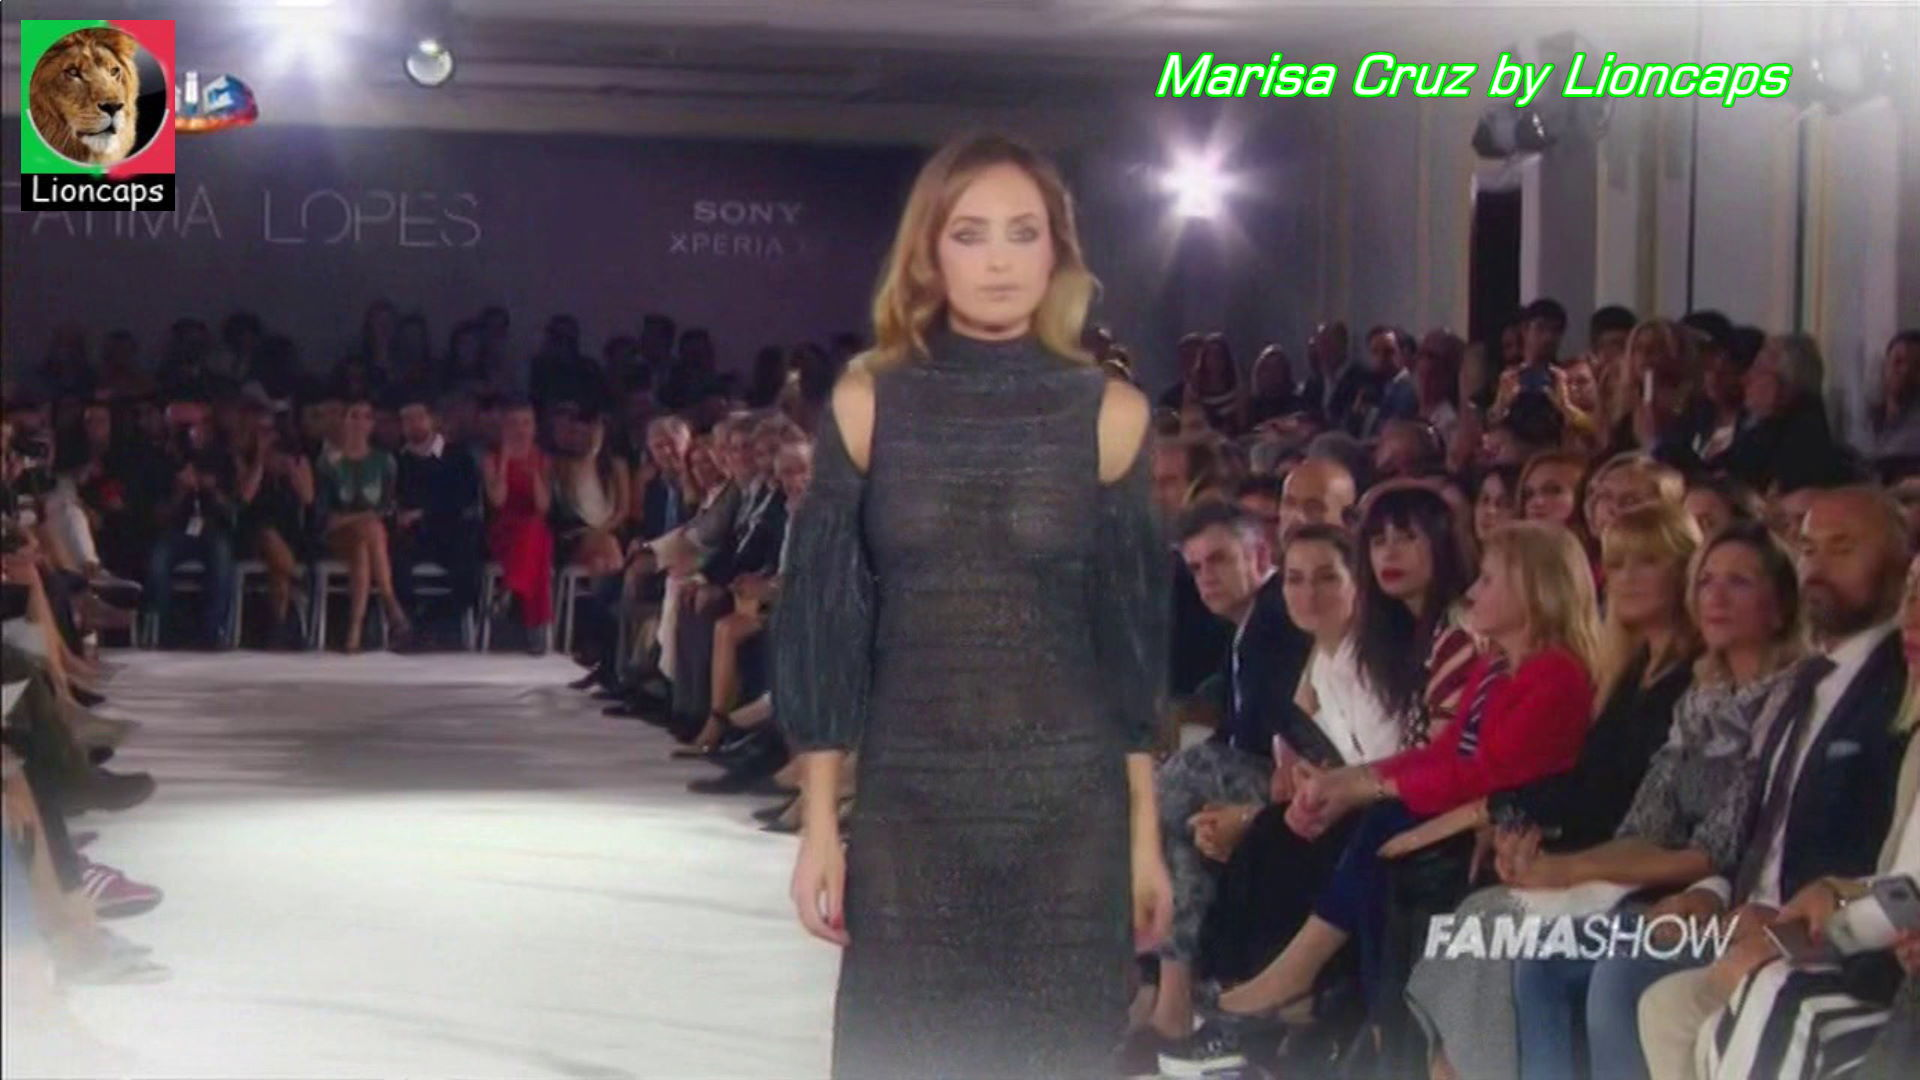 848404368_marisa_cruz_vs170827_1752_122_539lo.JPG